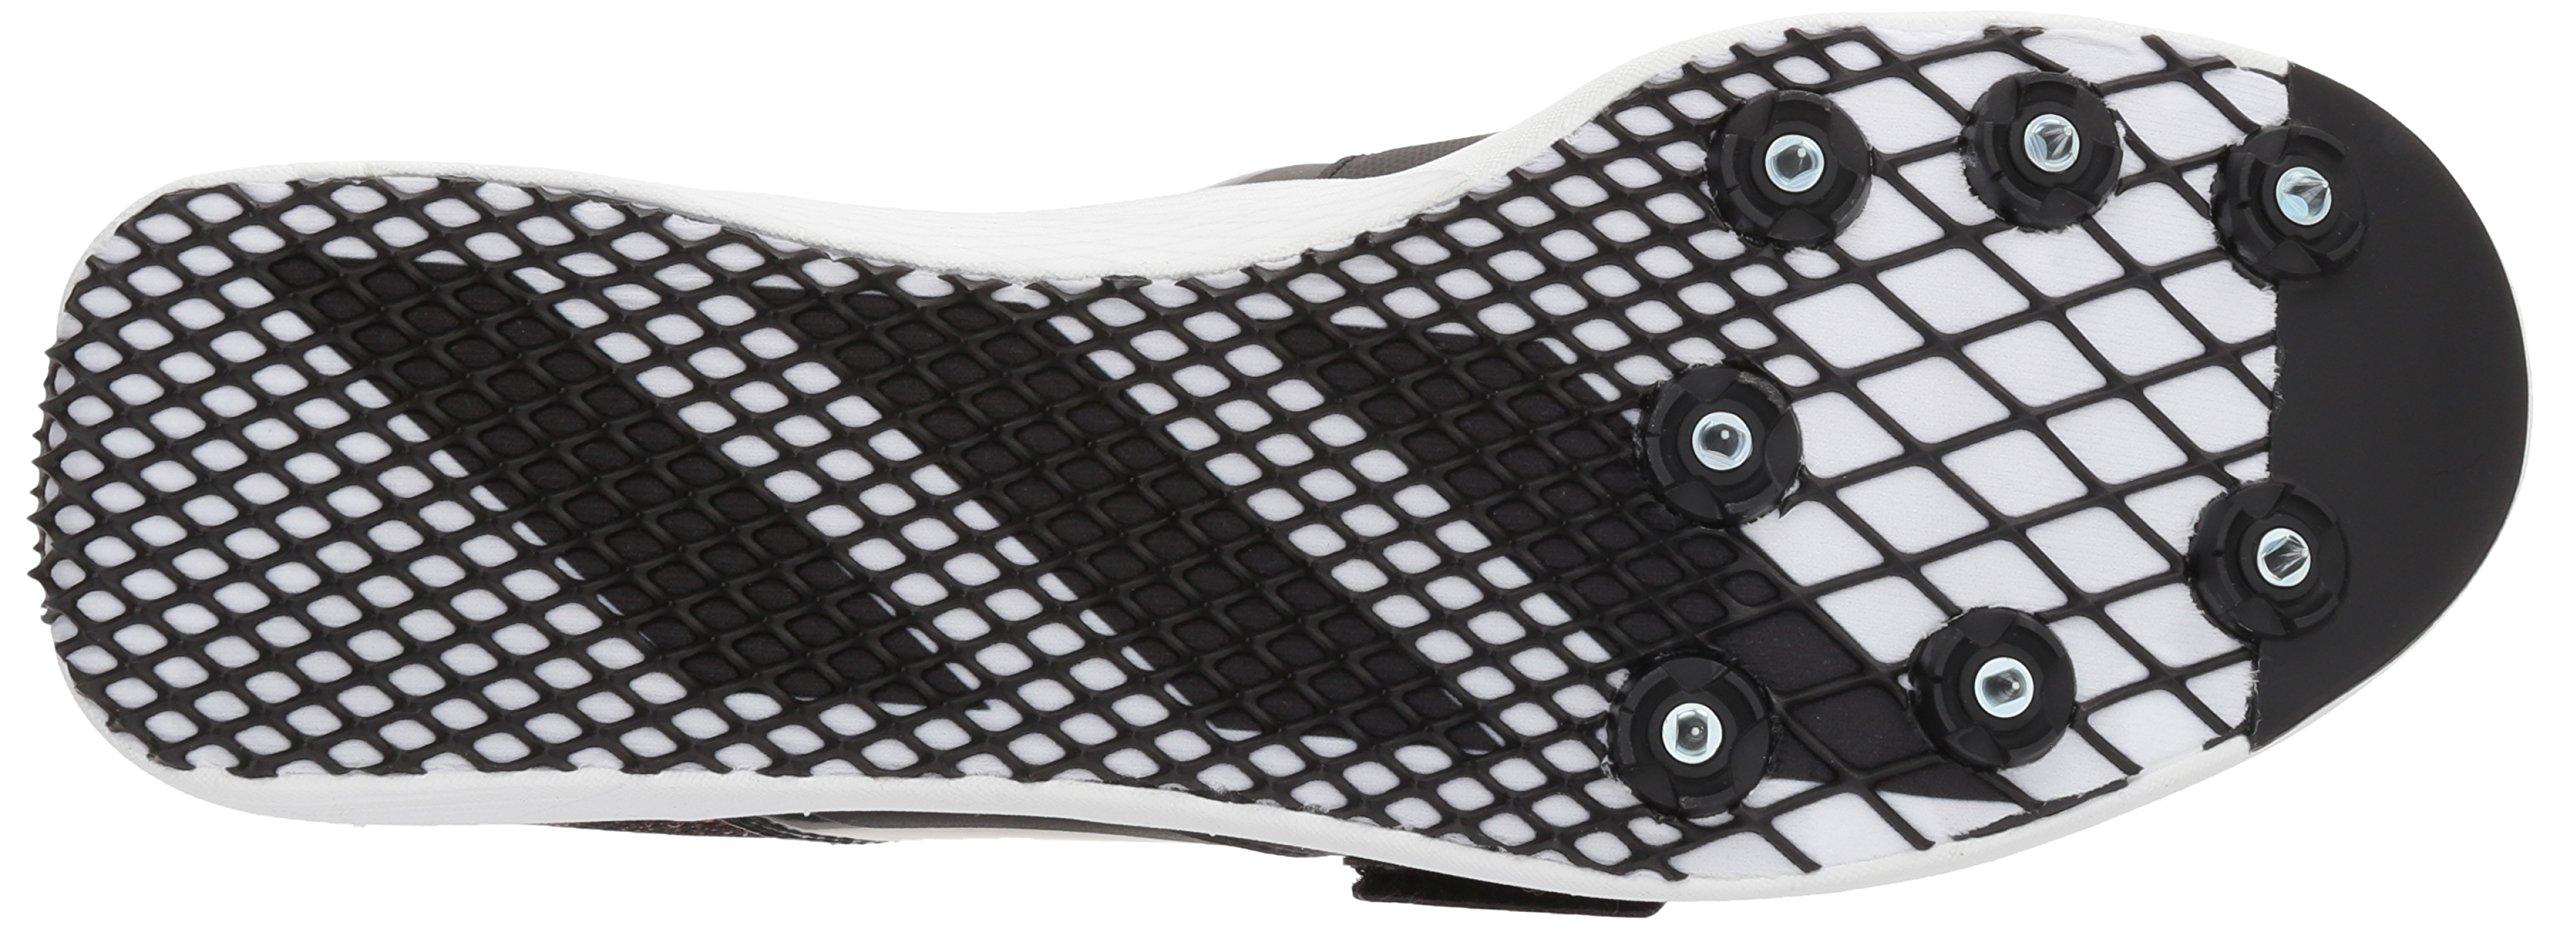 adidas Adizero tj/pv Running Shoe core Black, FTWR White, Orange 13.5 M US by adidas (Image #3)